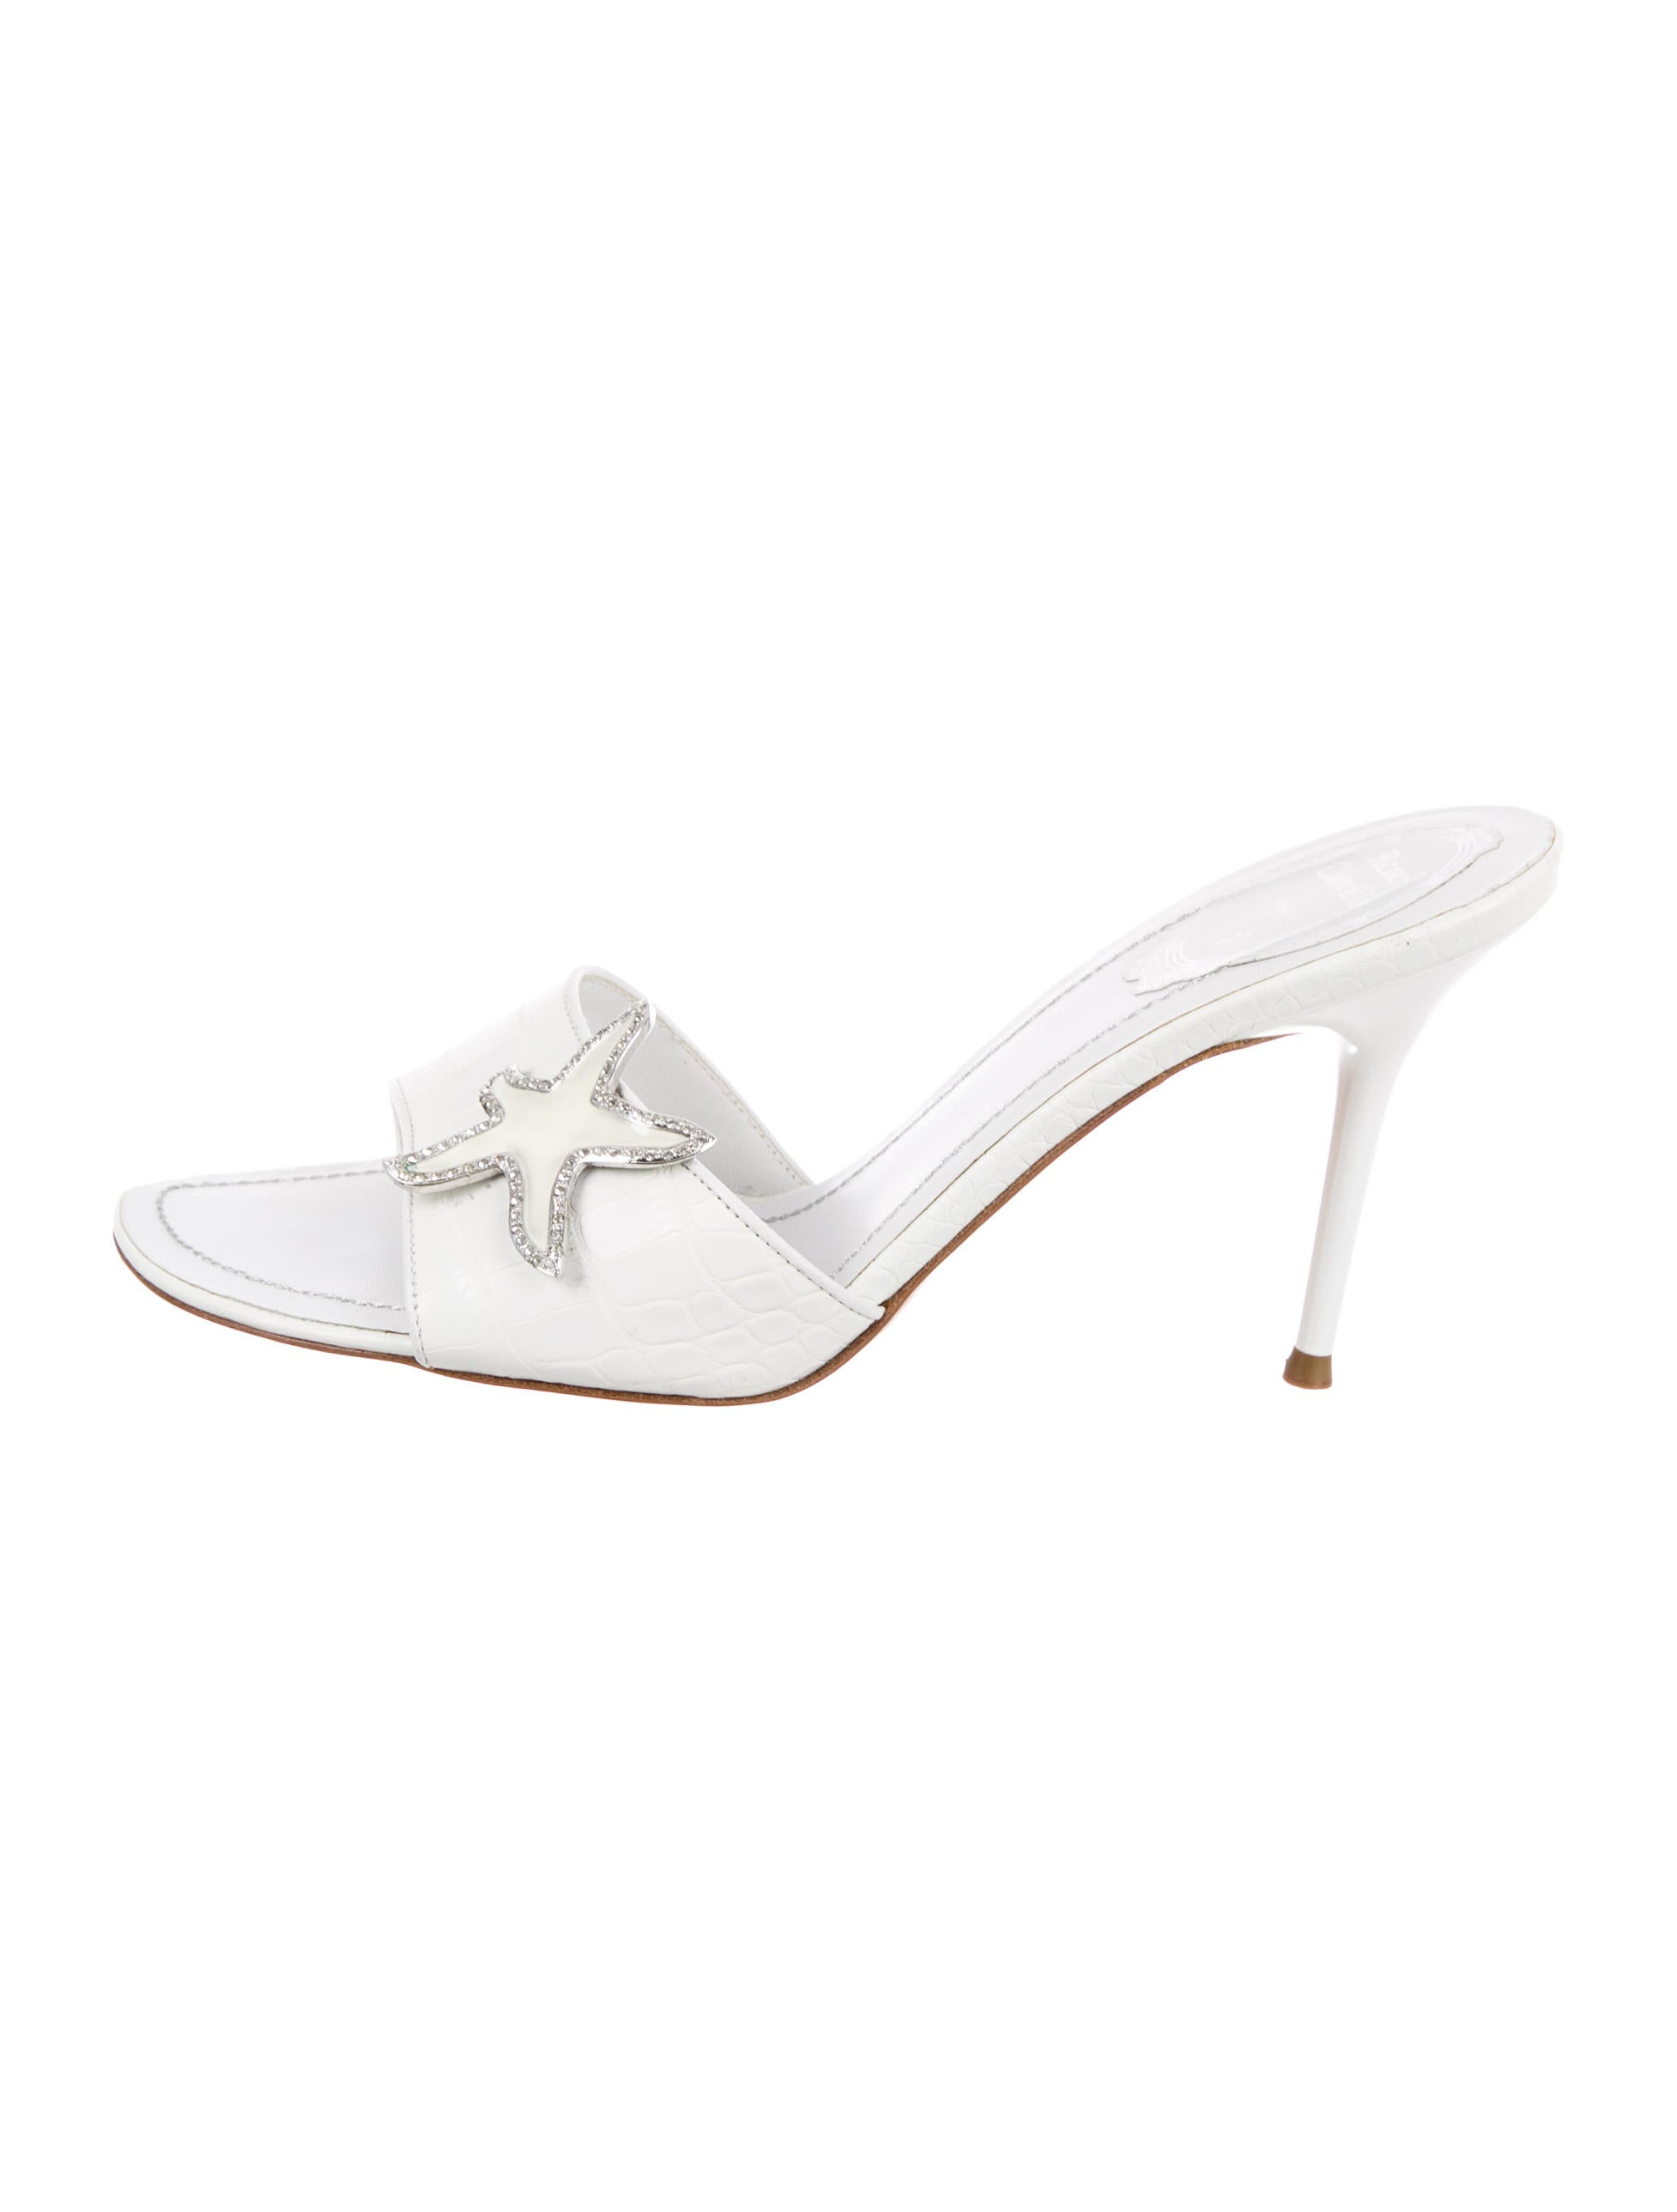 René Caovilla Embossed Slide Sandals 2015 for sale dSaXRdLJ